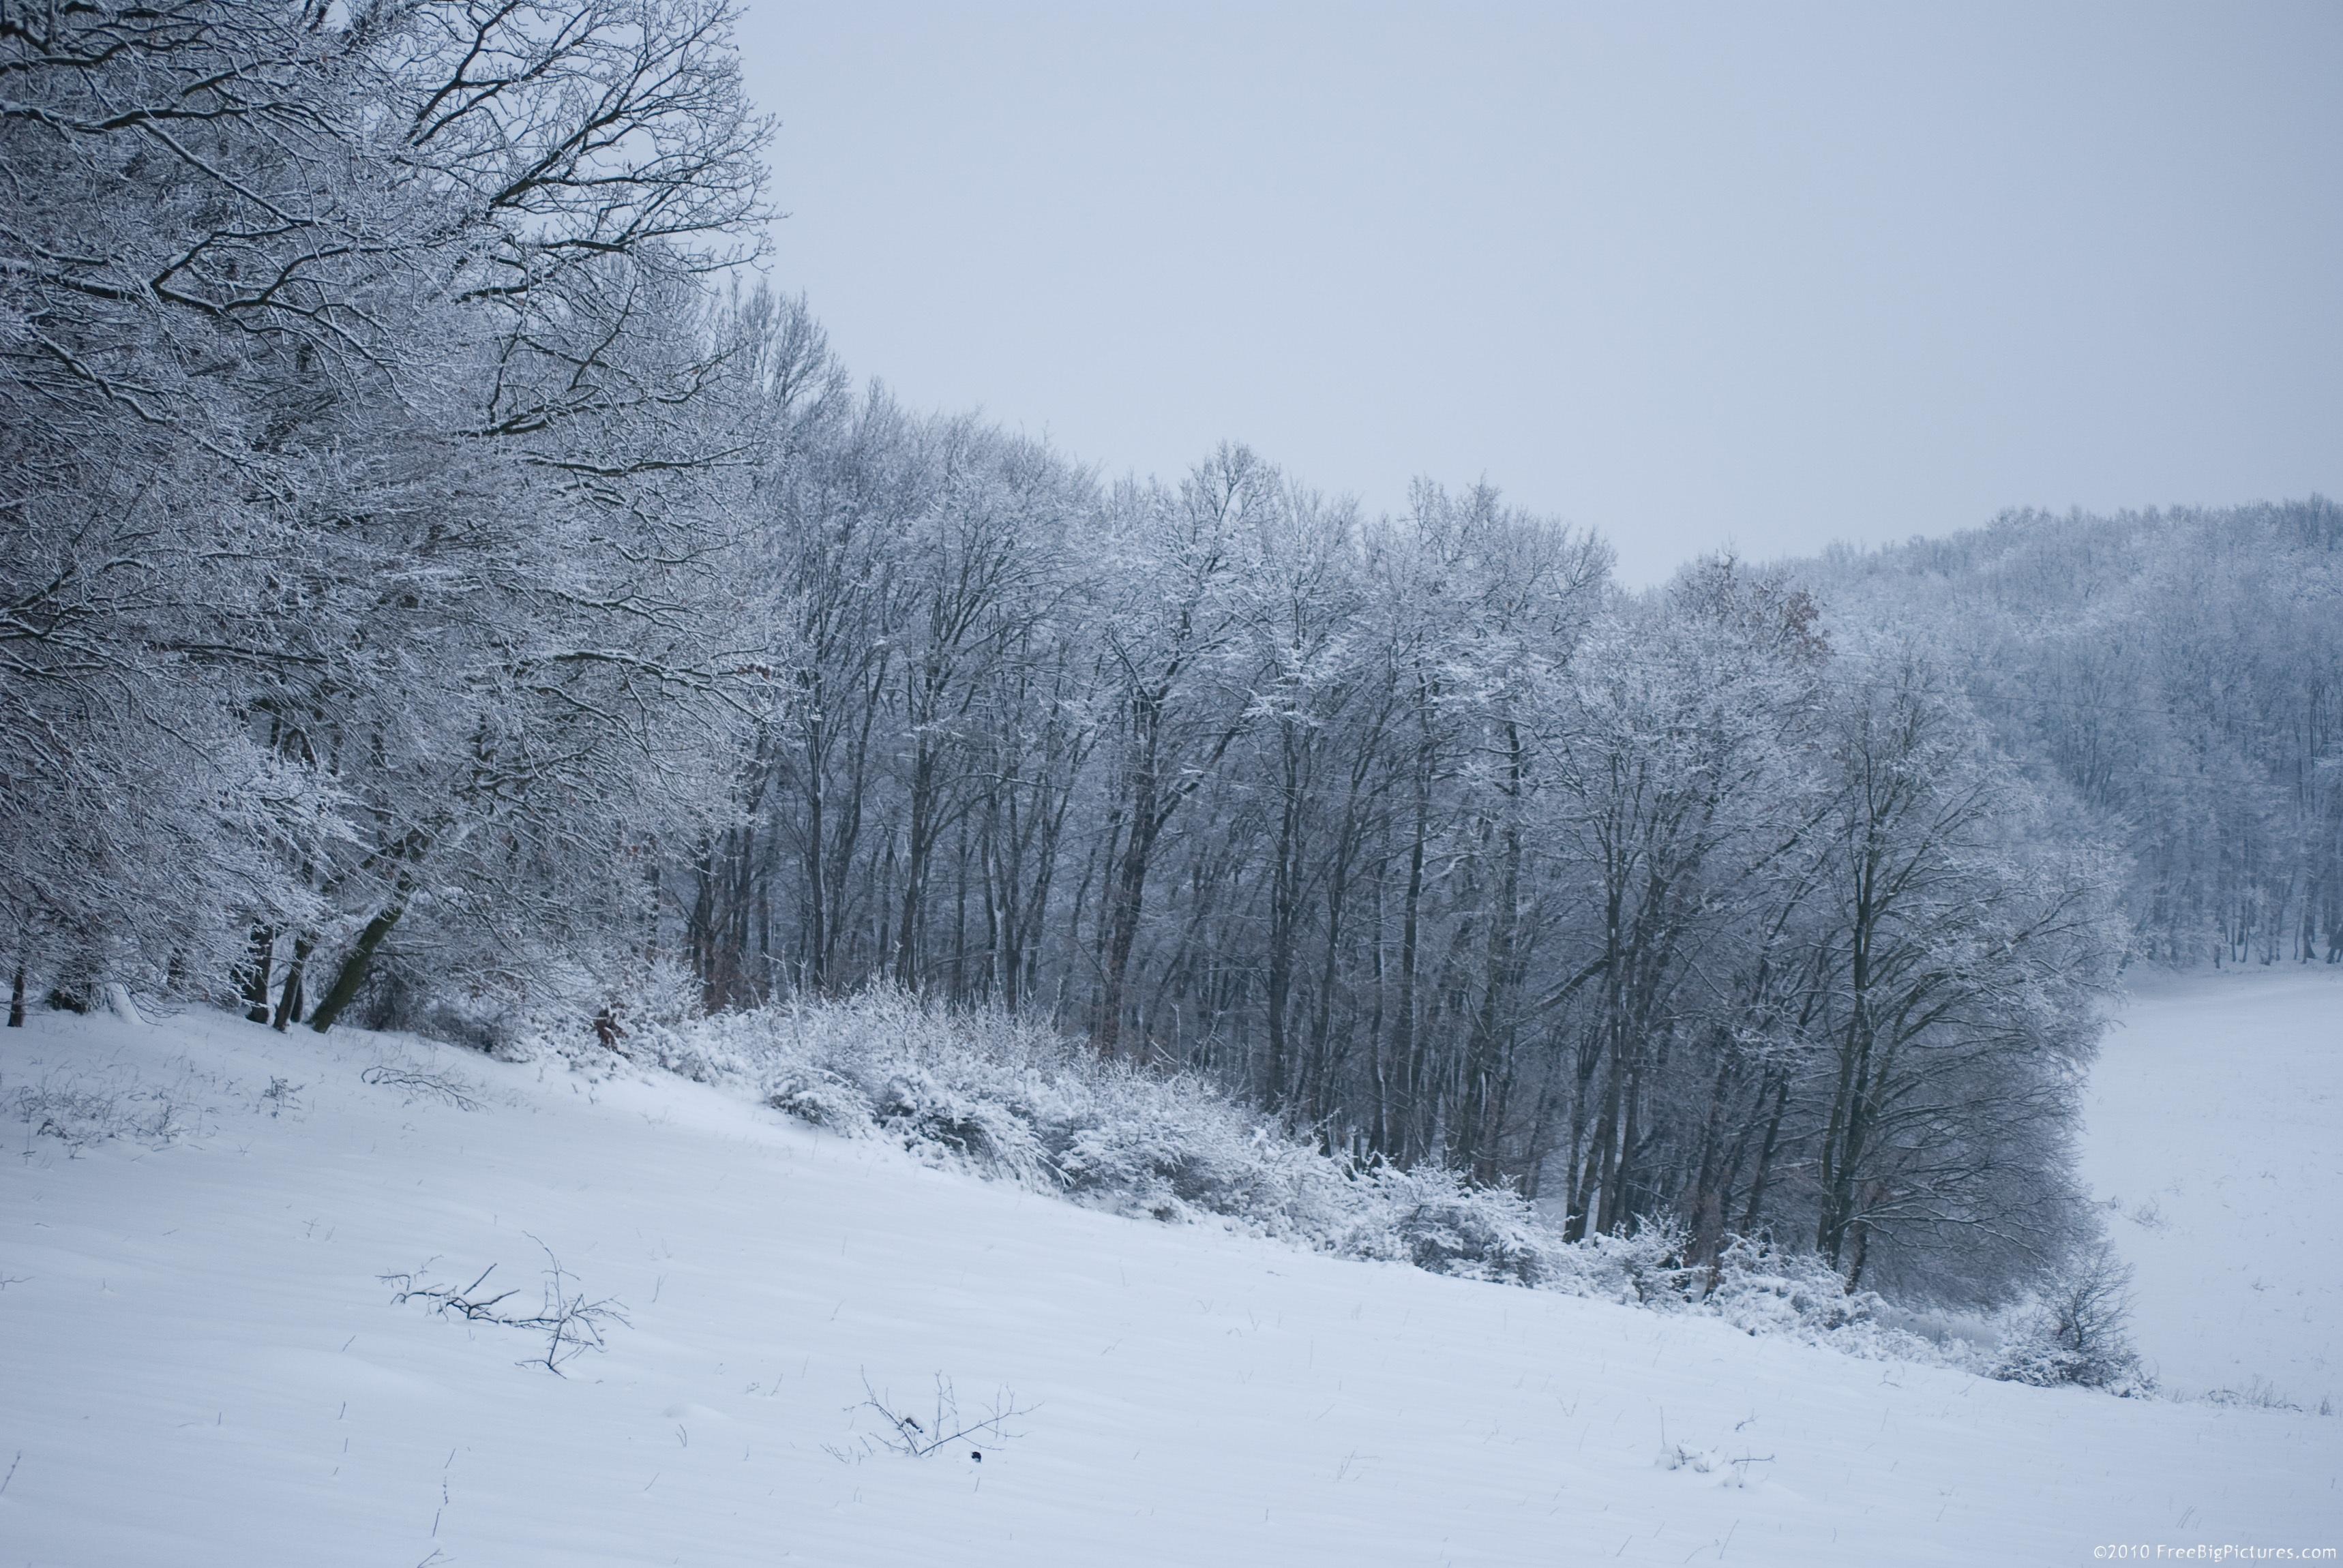 Free Snow Falling Animated Wallpaper Winter Landscape